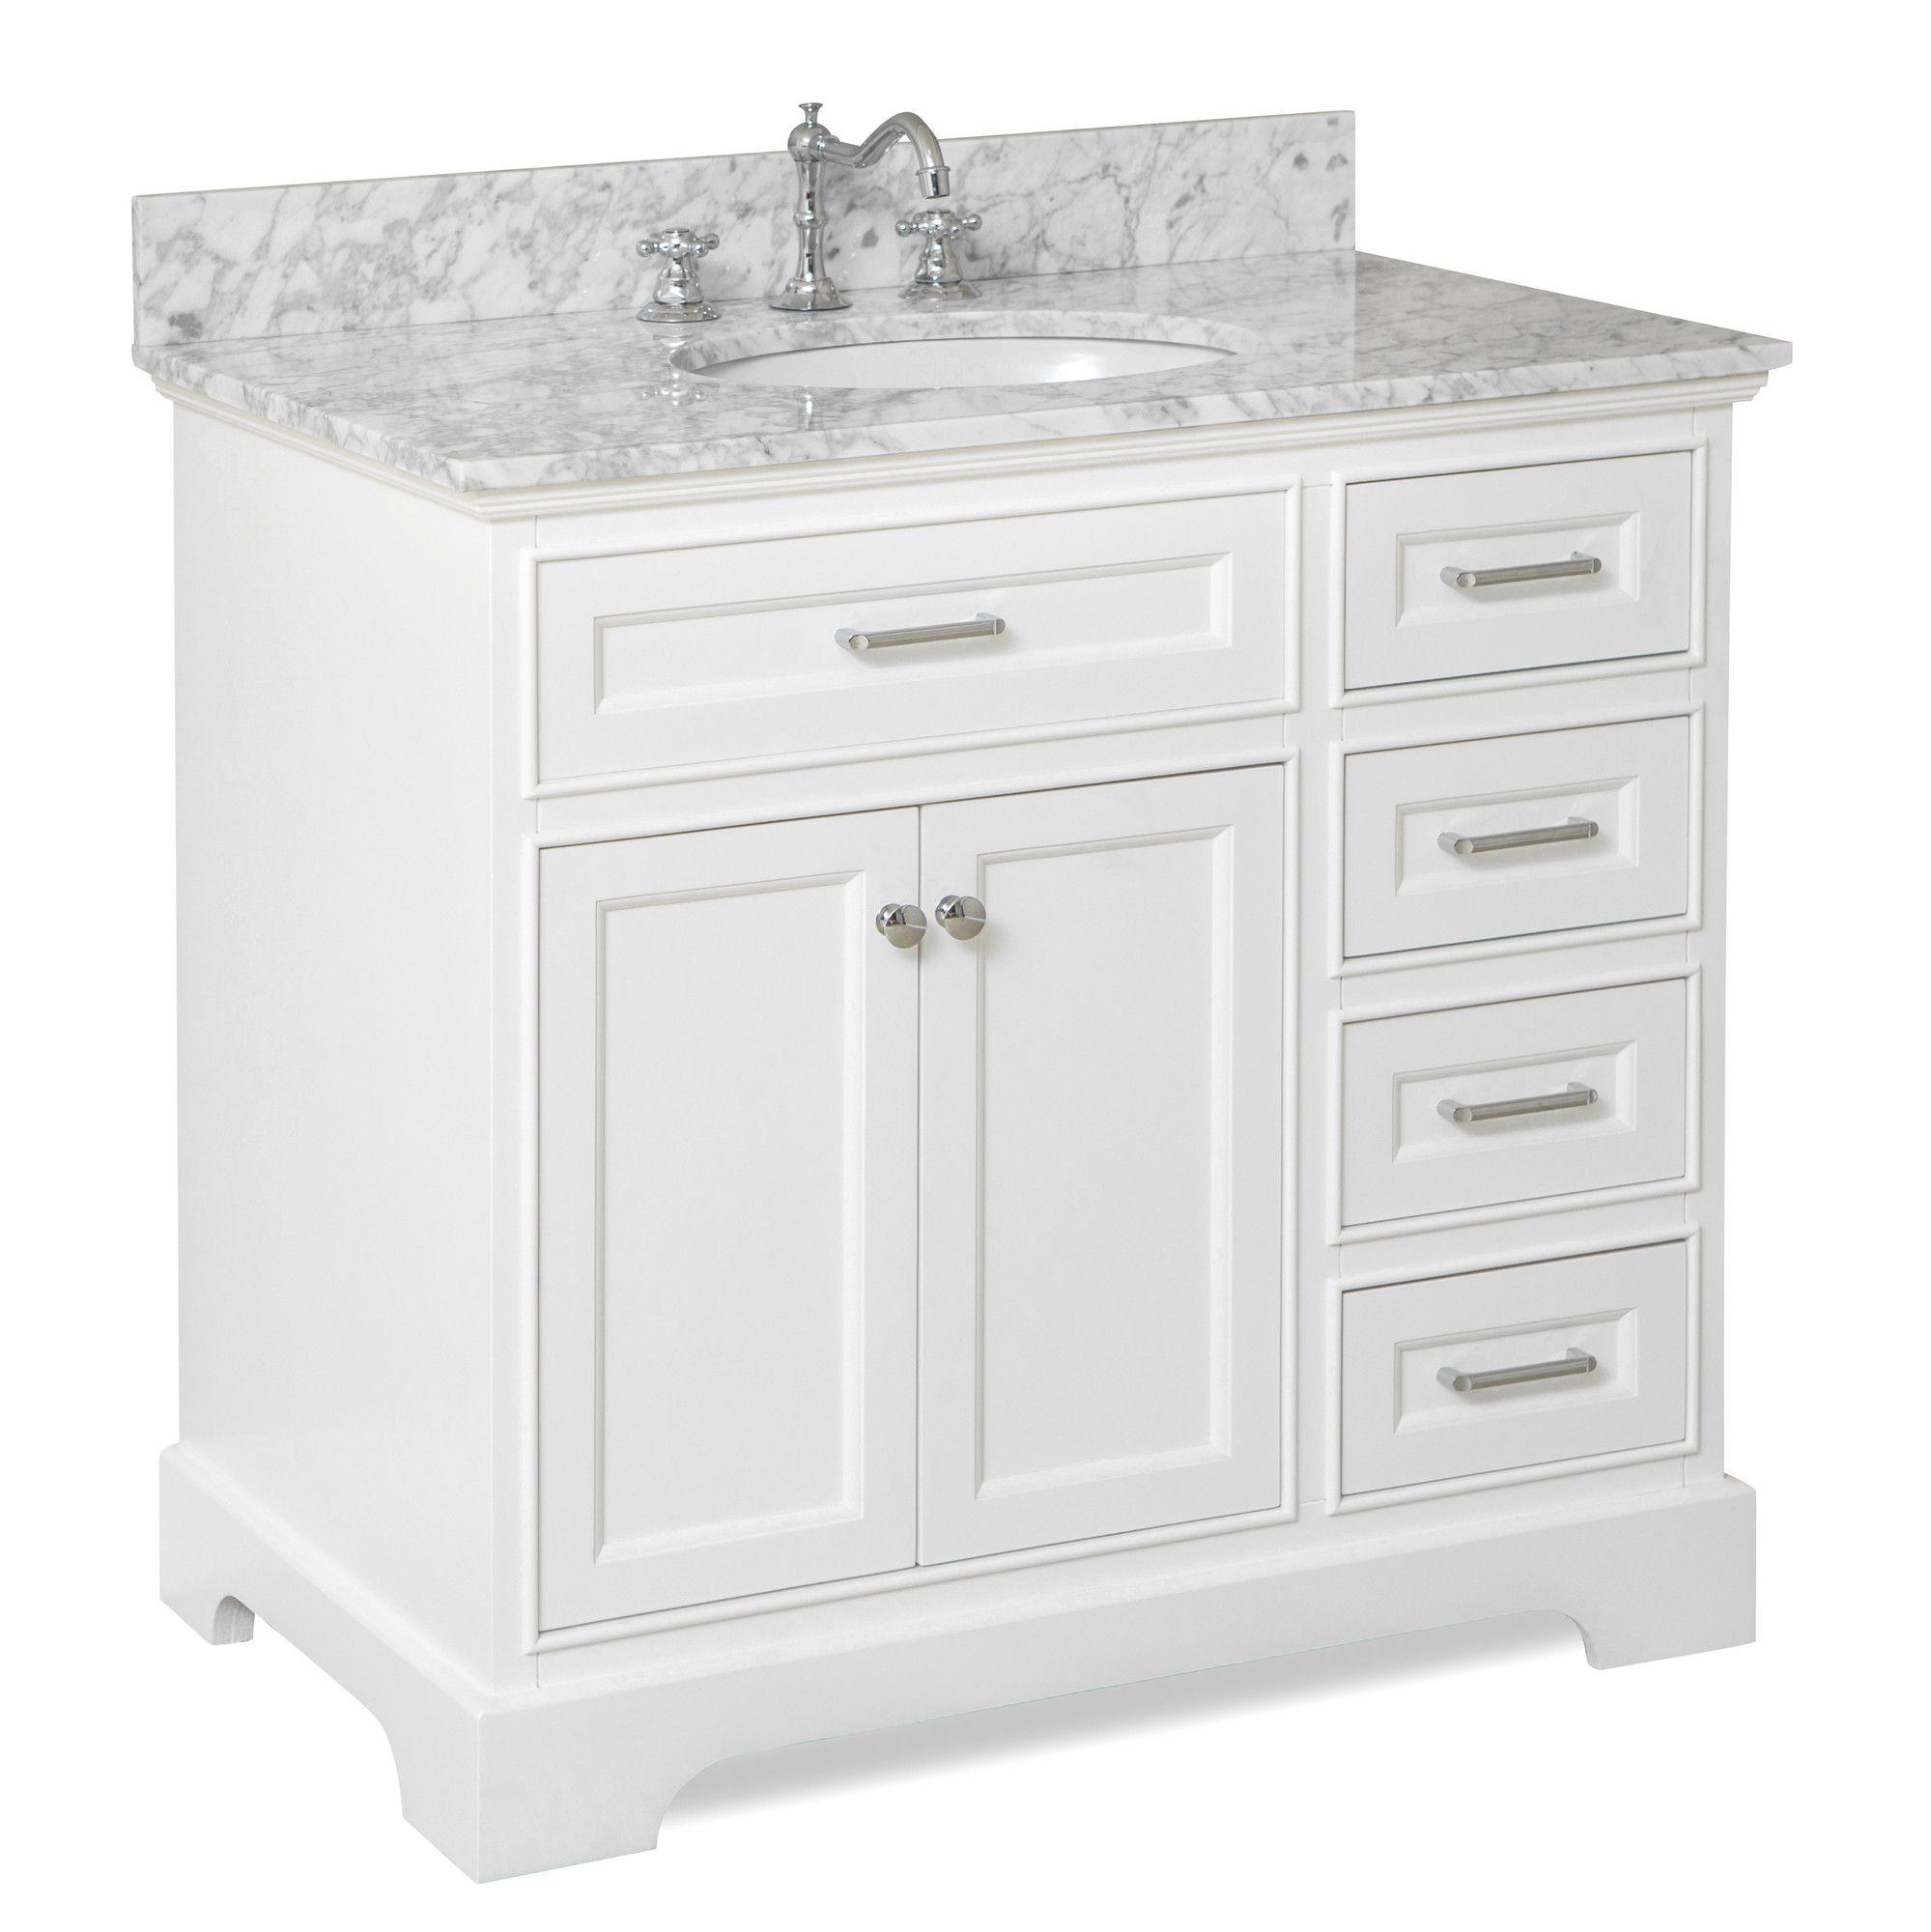 "aria 36"" single vanity setkitchen bath collection"